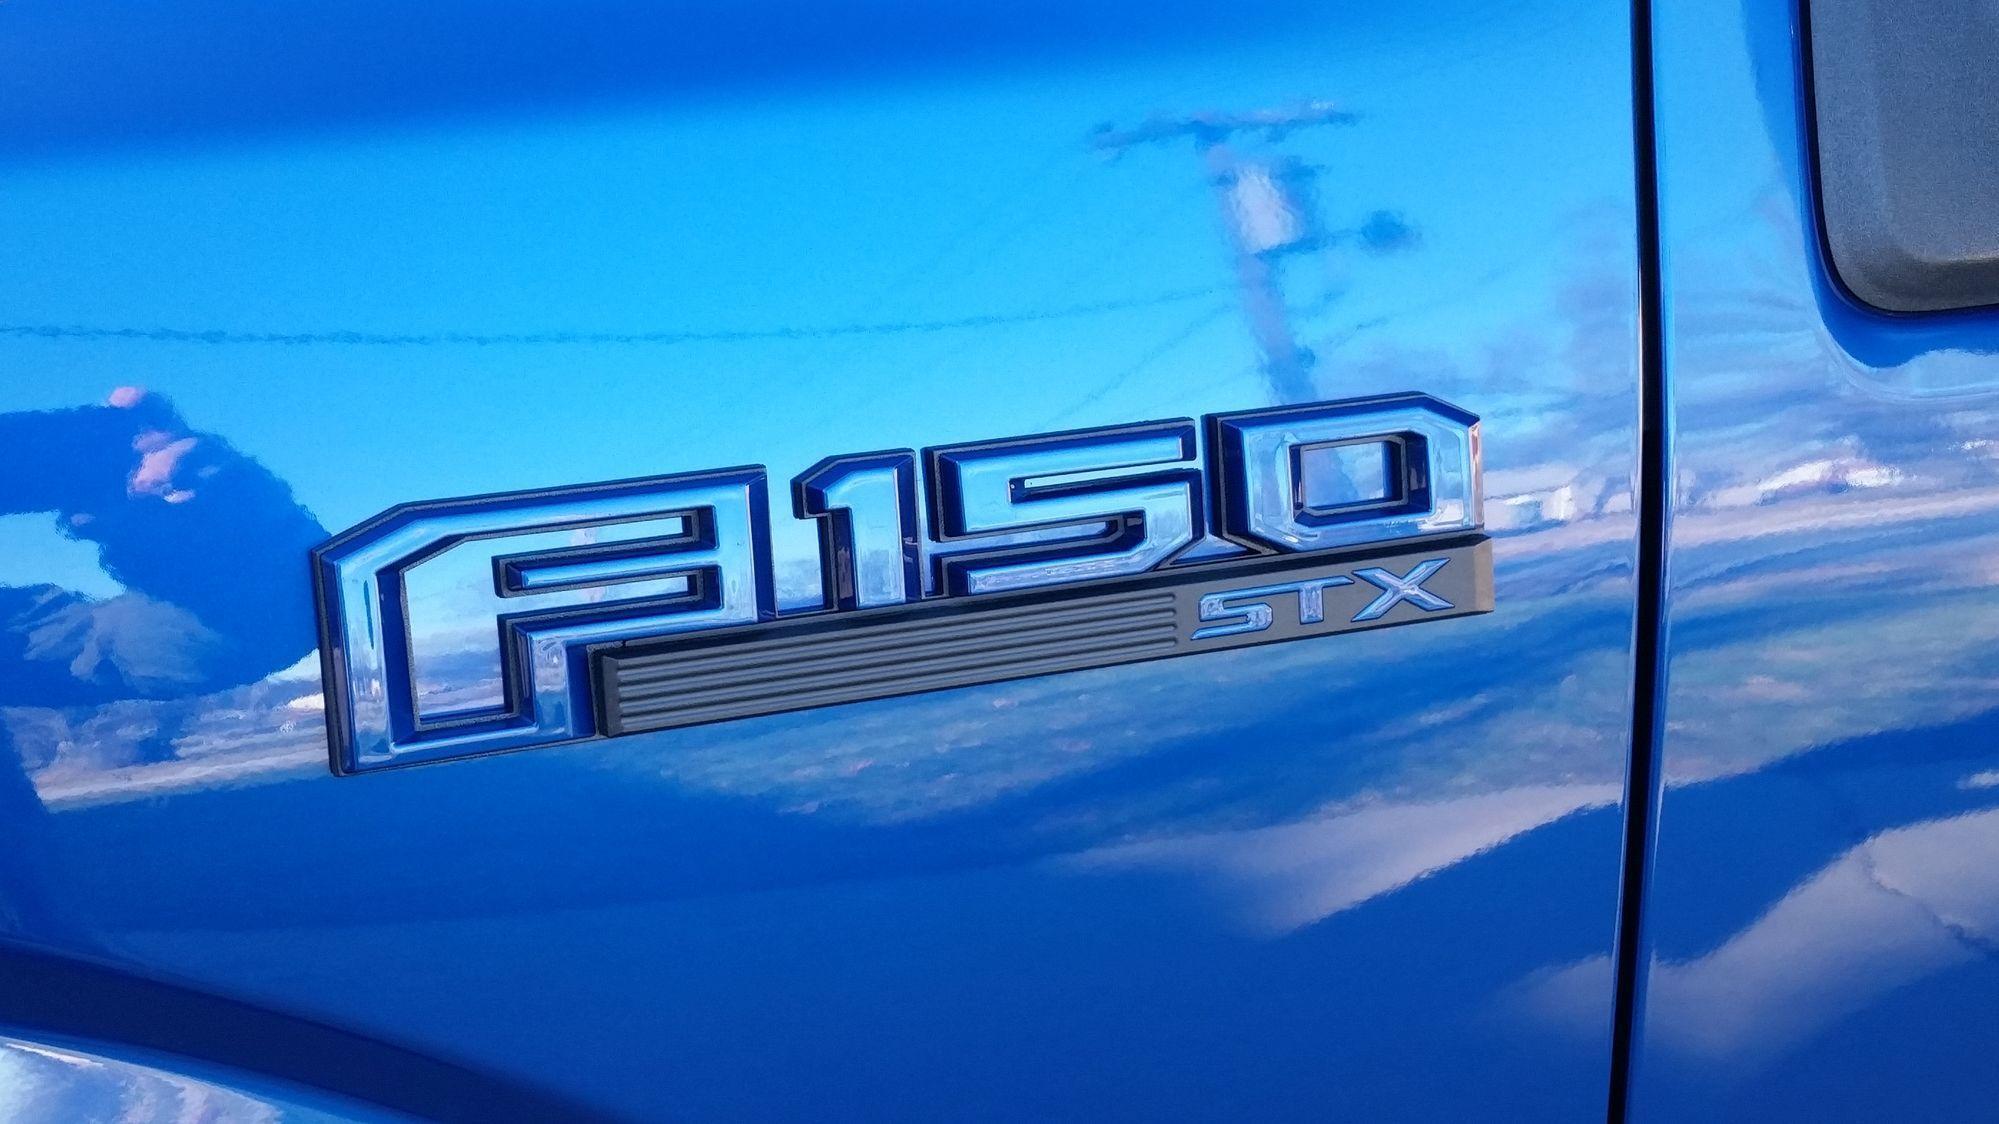 Custom Ford F150 Emblems >> Looking for red/black fender emblem for STX - Ford F150 ...